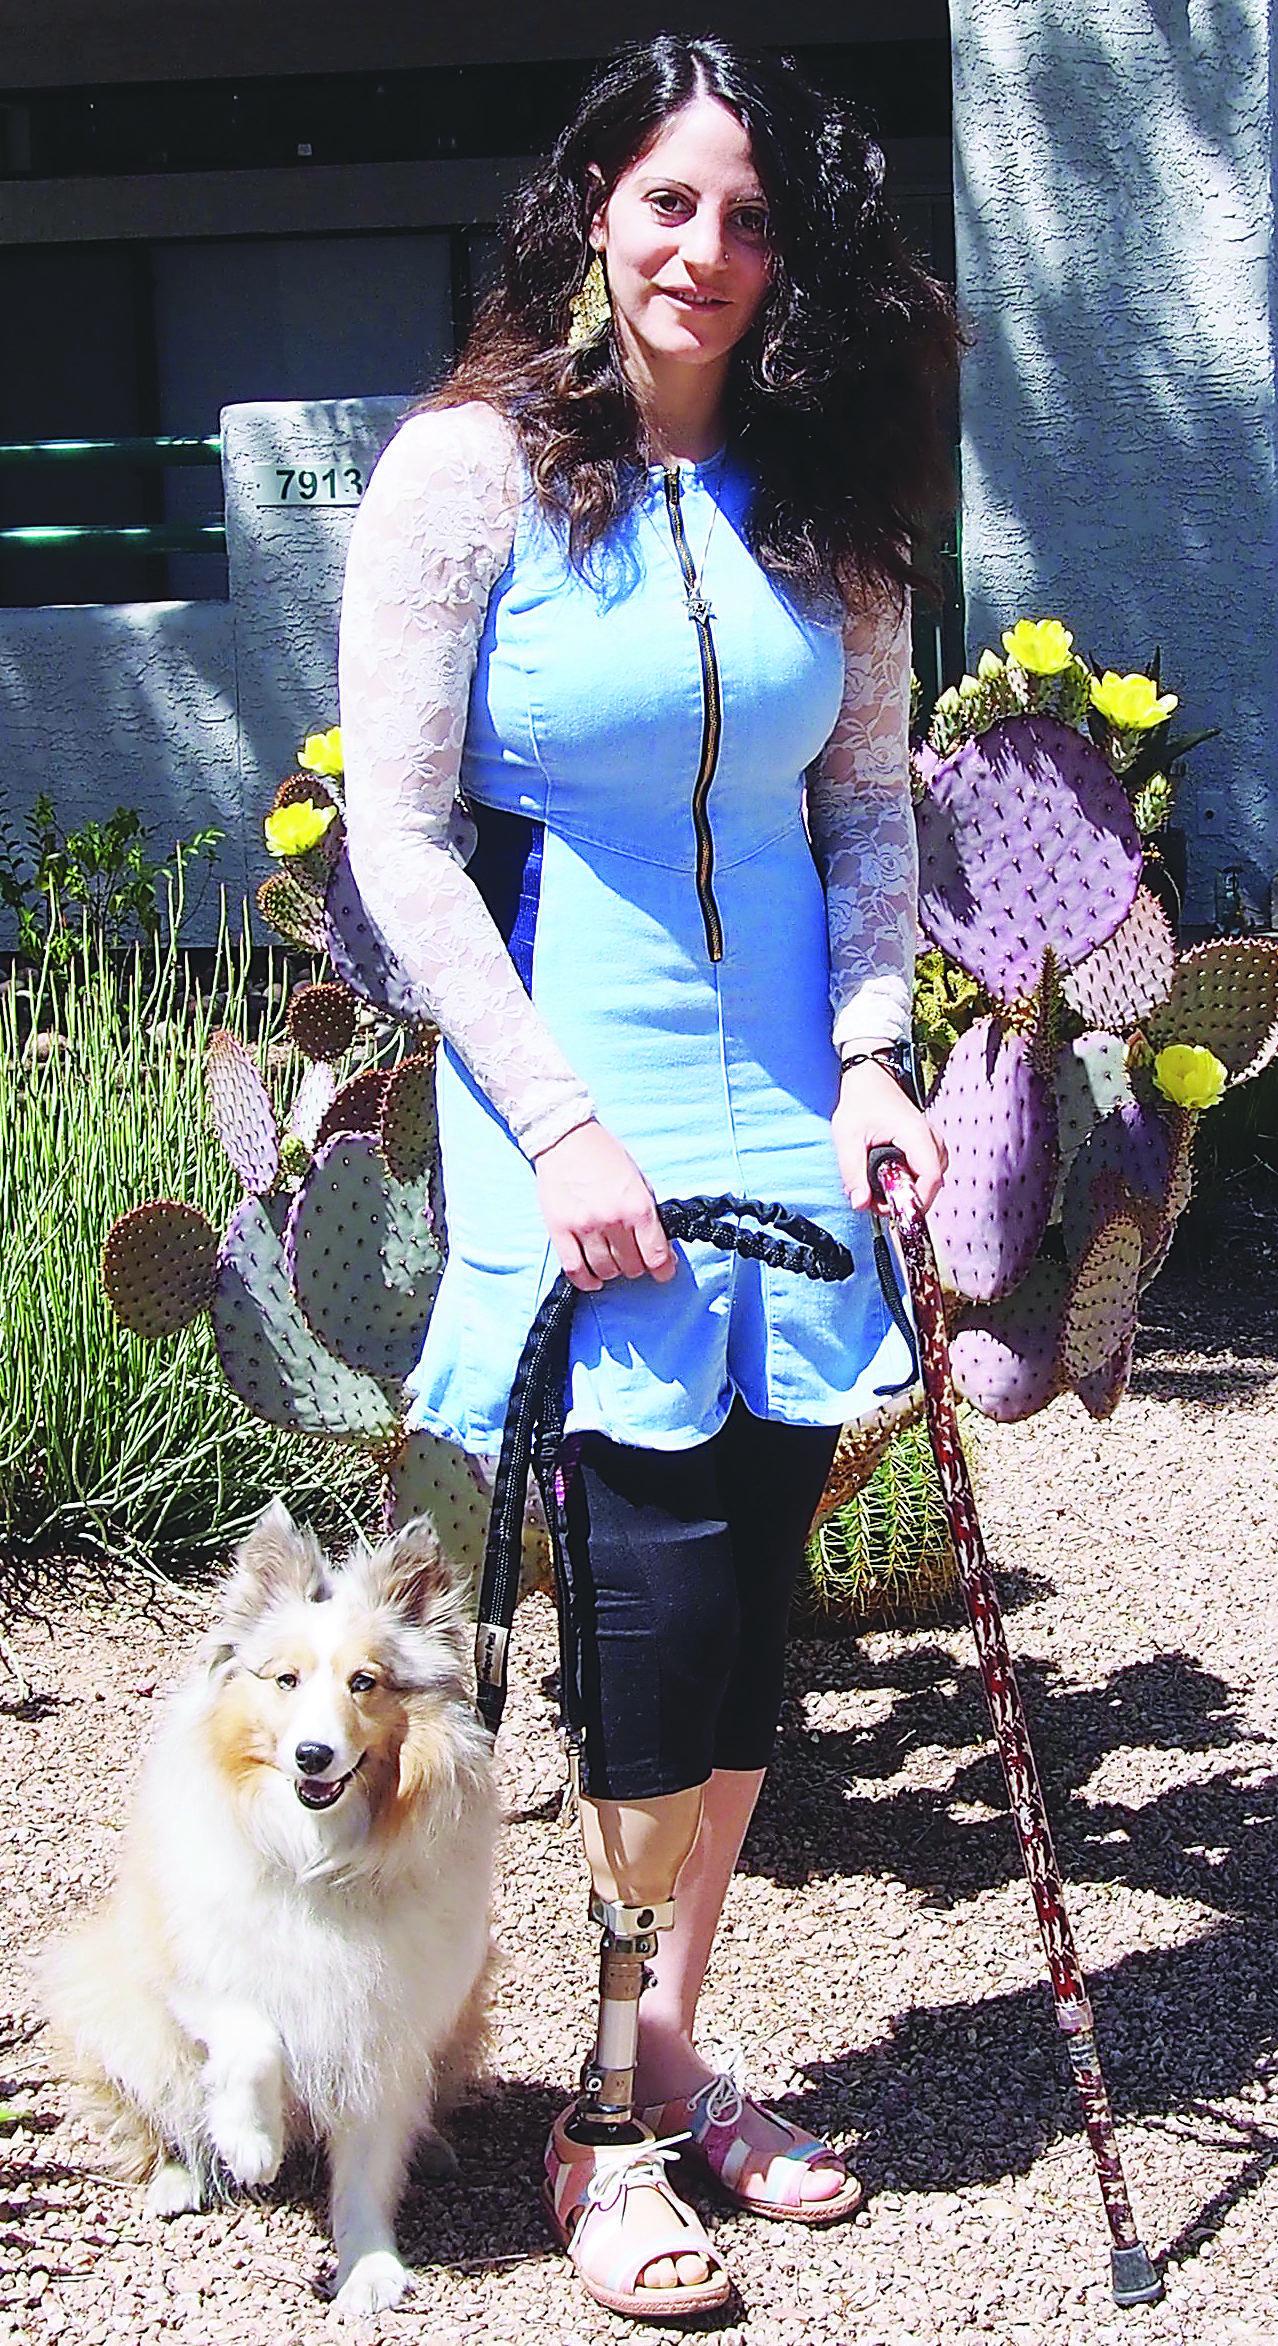 Local Womans Pet Proves Its Dedication As Handi Dog, Az Jewish